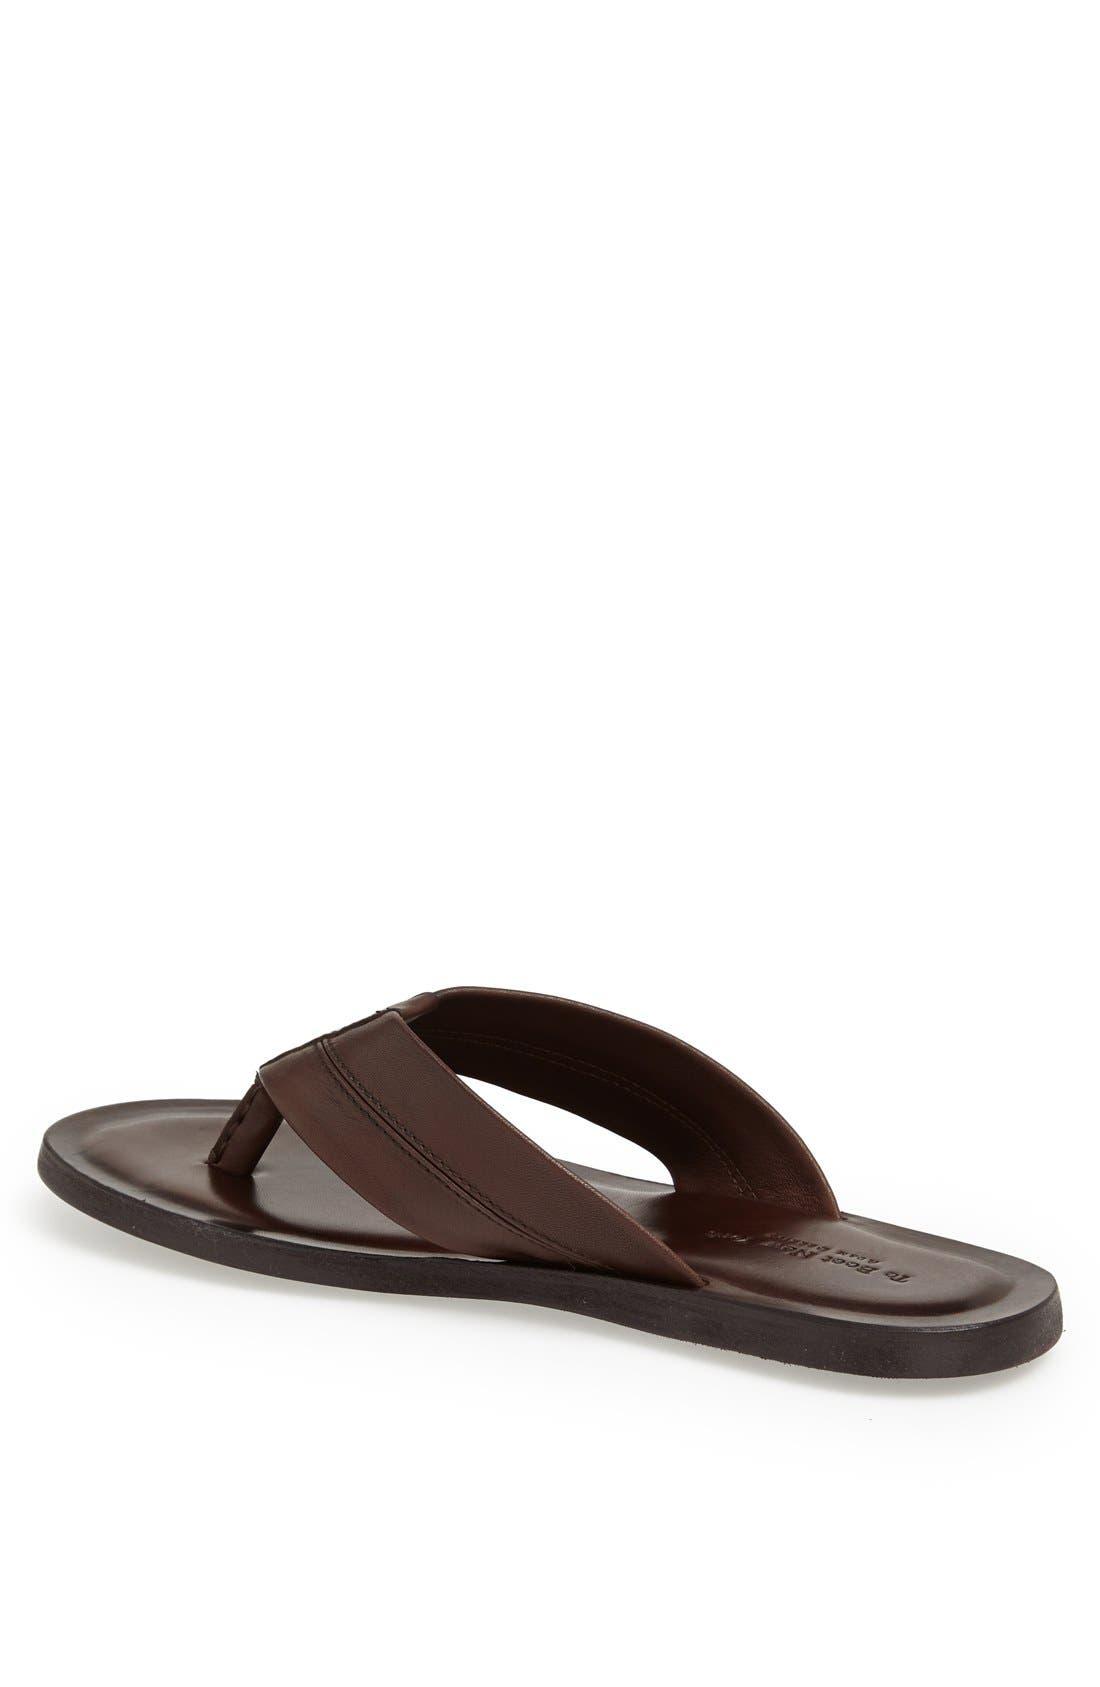 Alternate Image 2  - To Boot New York 'La Hoya' Leather Flip Flop